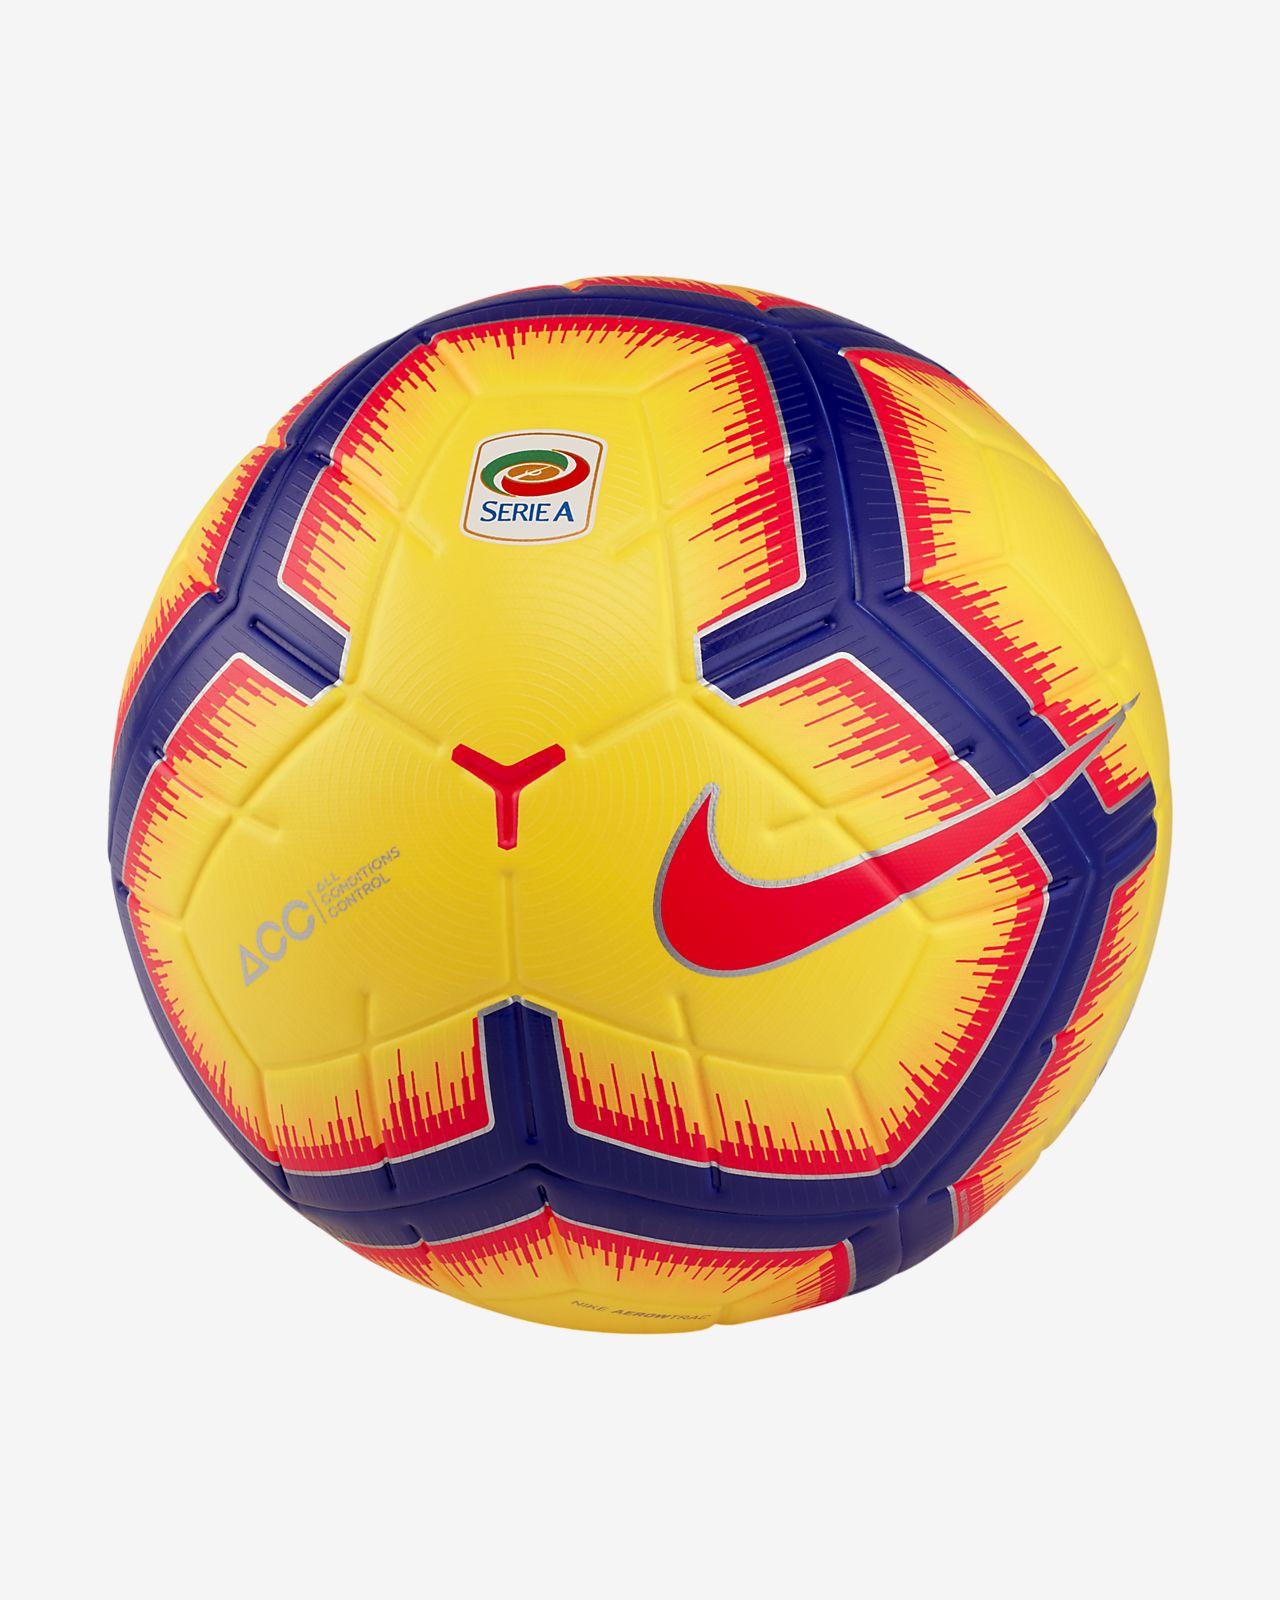 Serie A Merlin Fußball